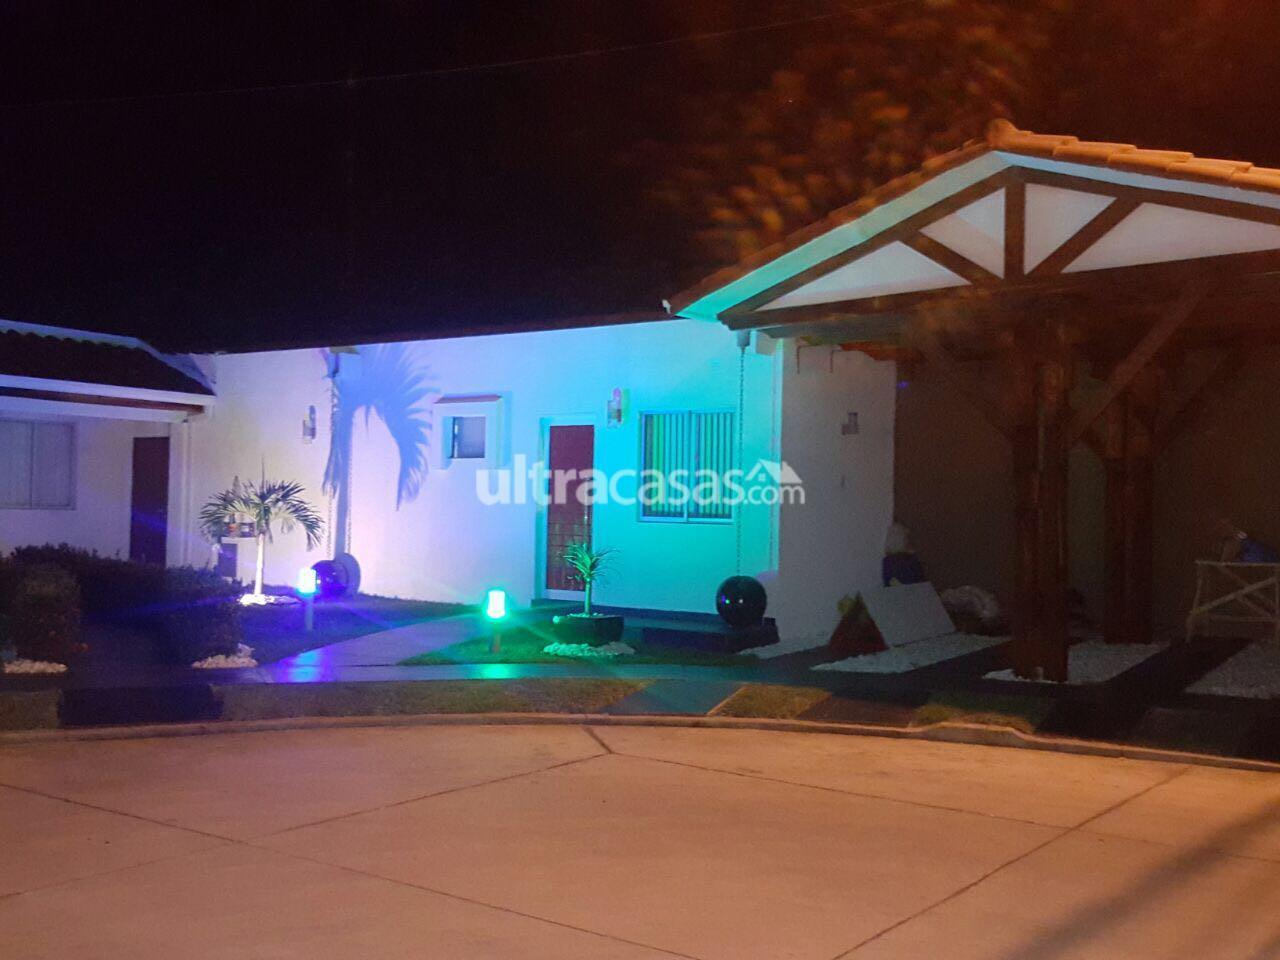 Casa en Venta Av. Banzer km, 10, condominio Sevilla Las Terazas I, calle San Pedro Oeste 24. Foto 1